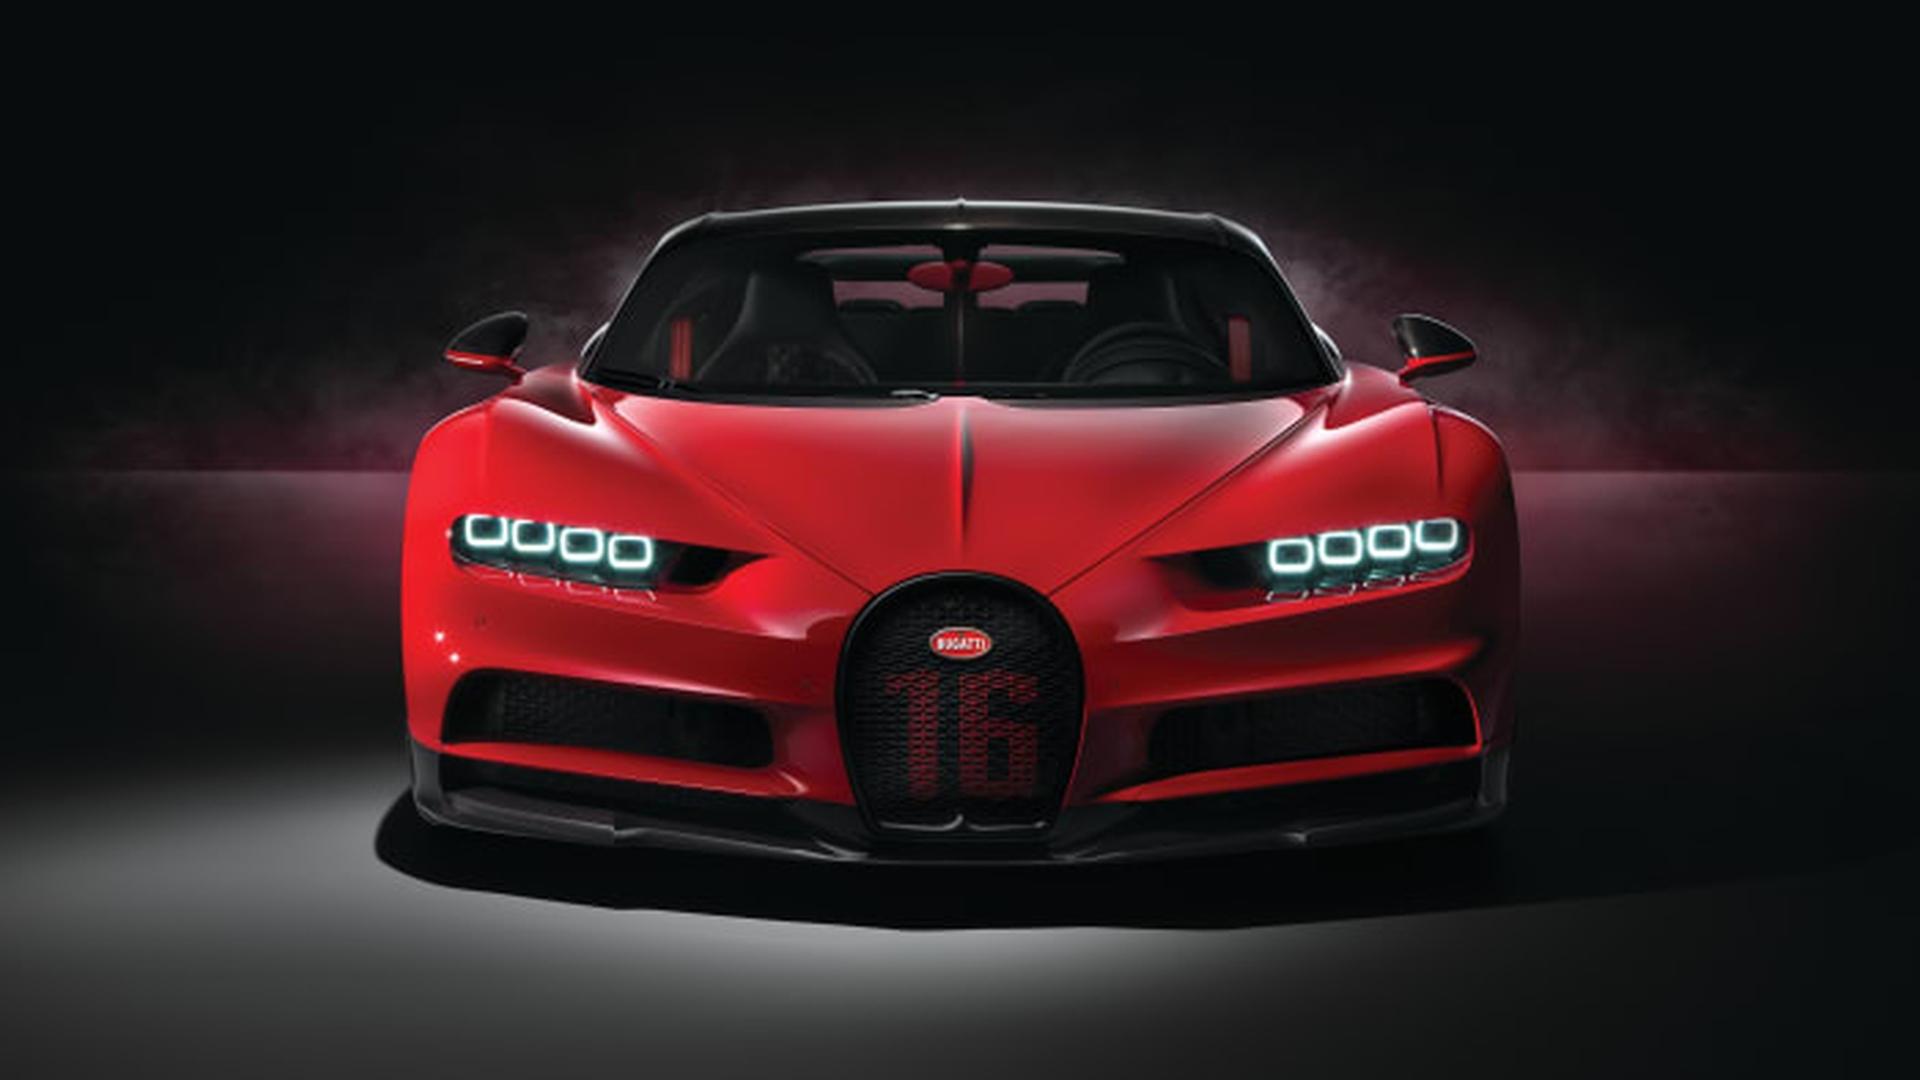 01-bugatti-chiron-sport-front-printjpg.jpg